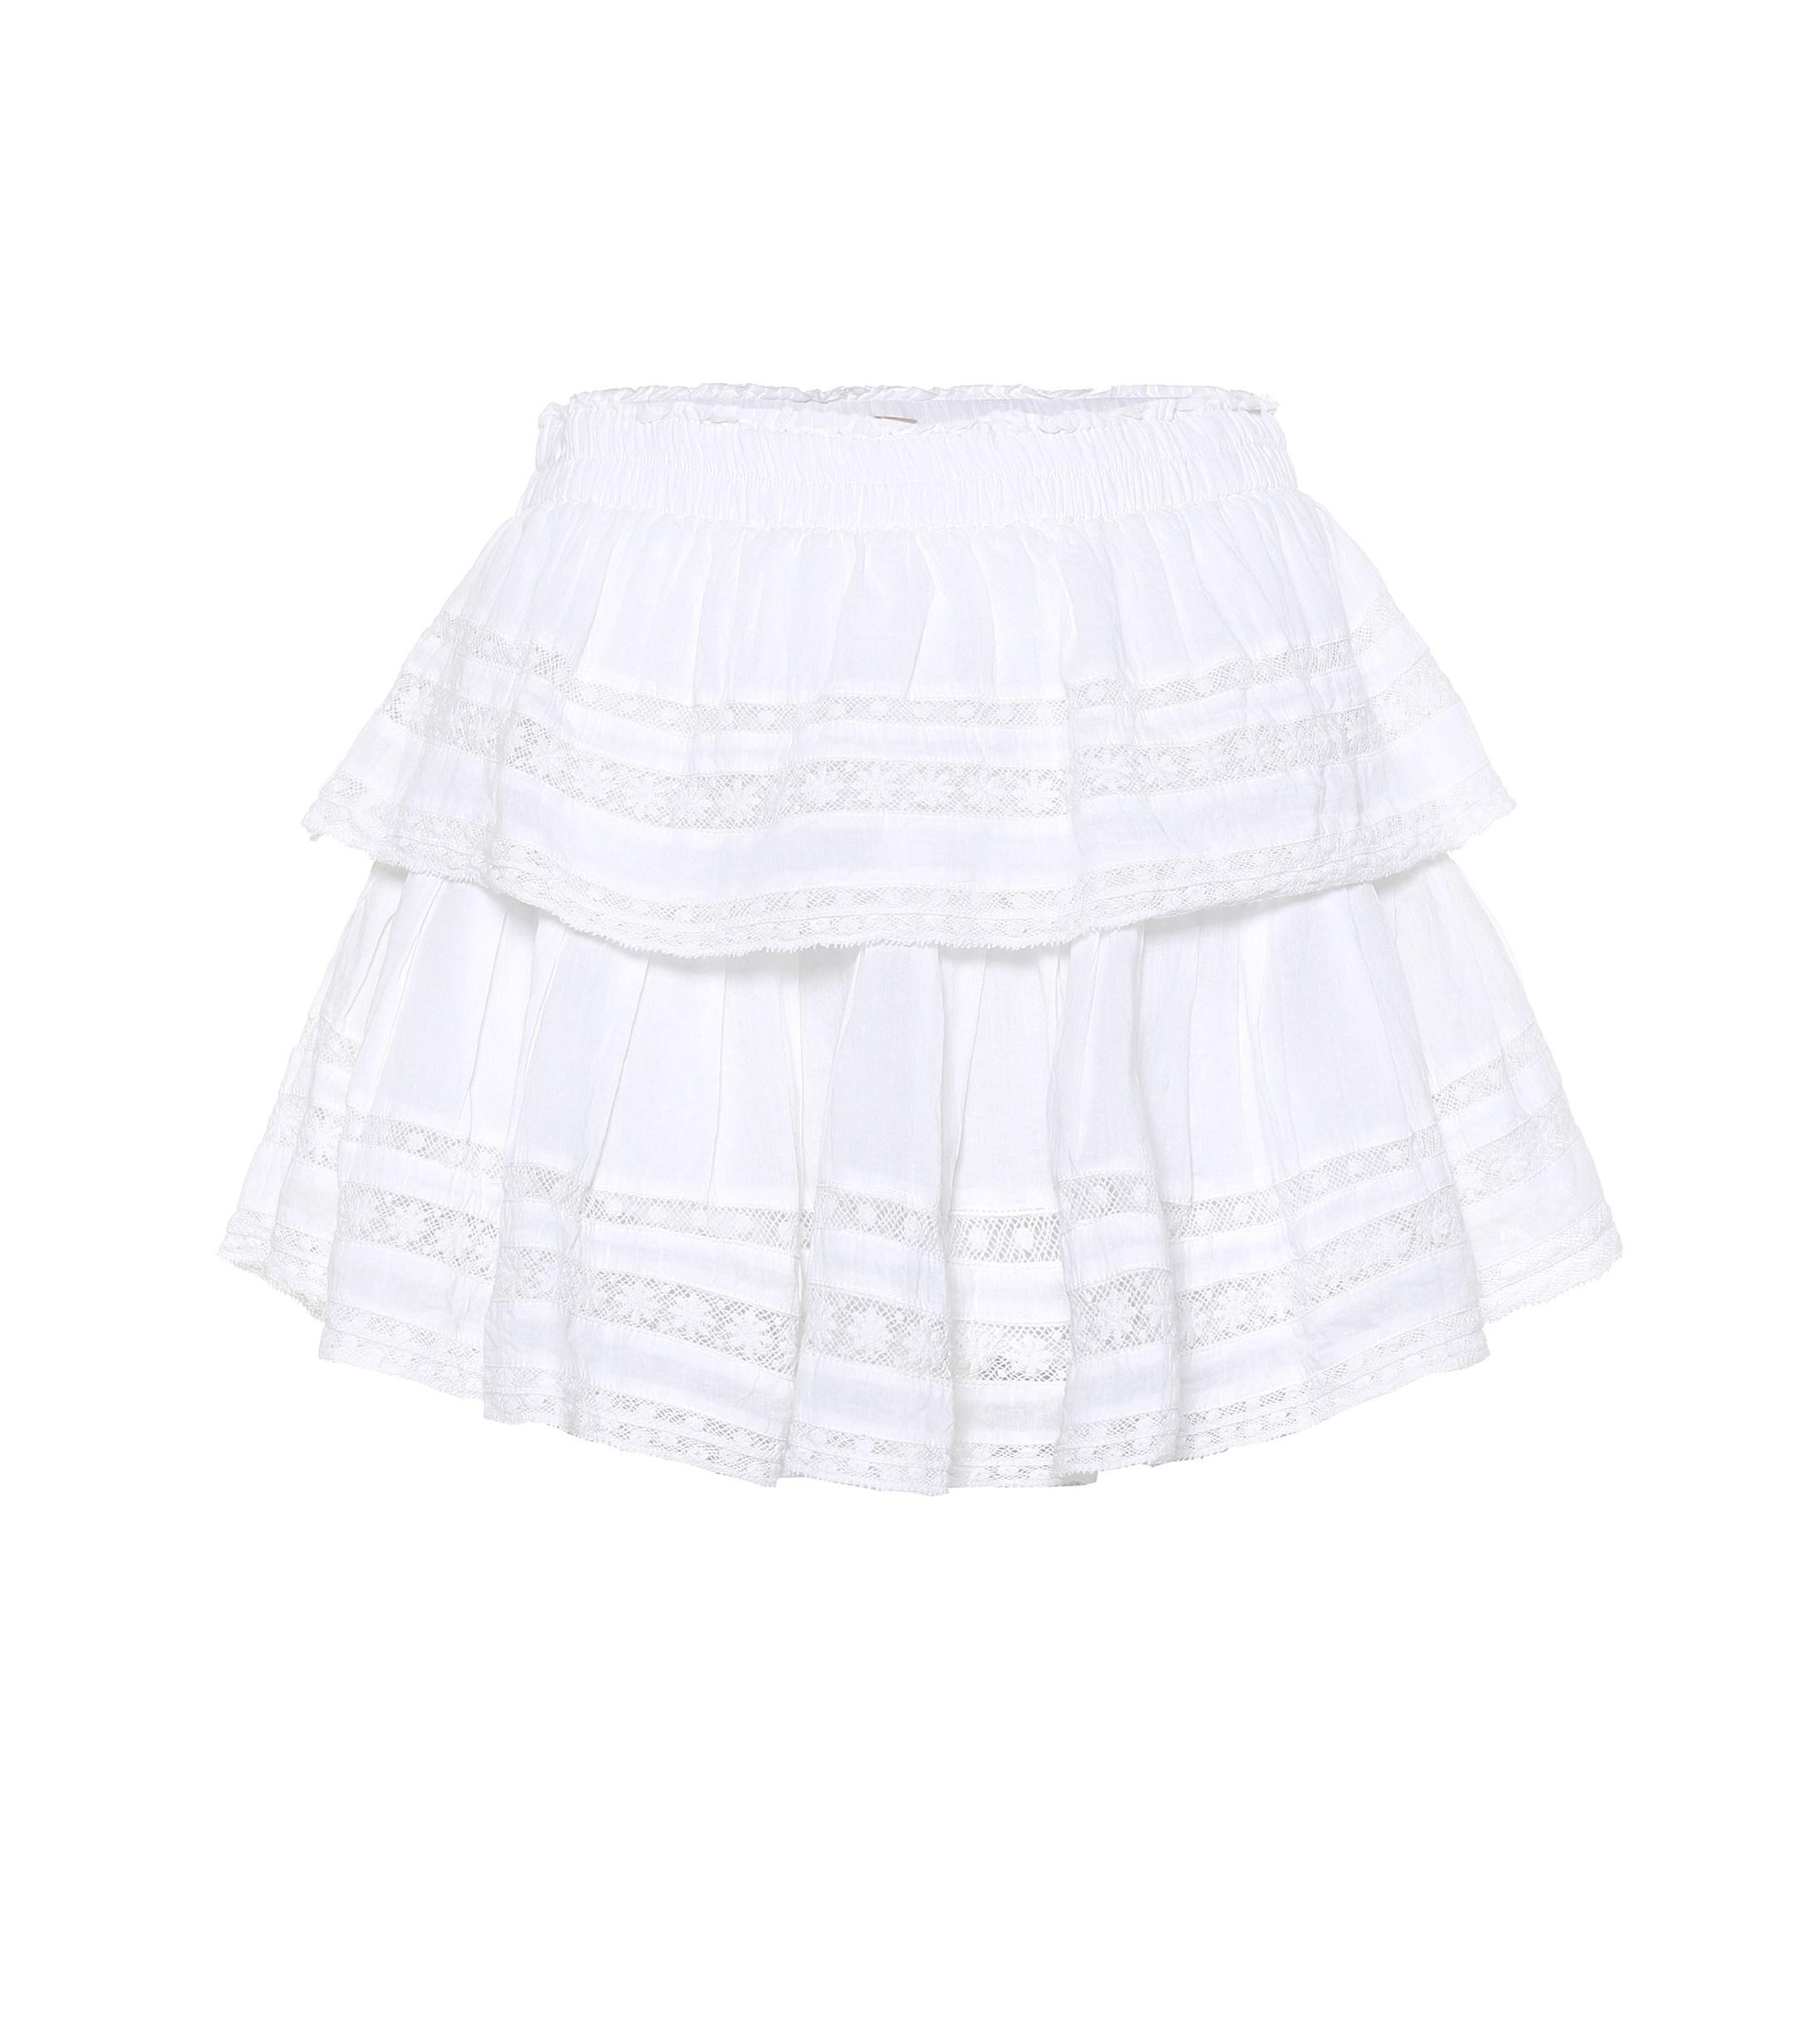 Loveshackfancy Eyelet Amp Lace Trim Cotton Miniskirt In